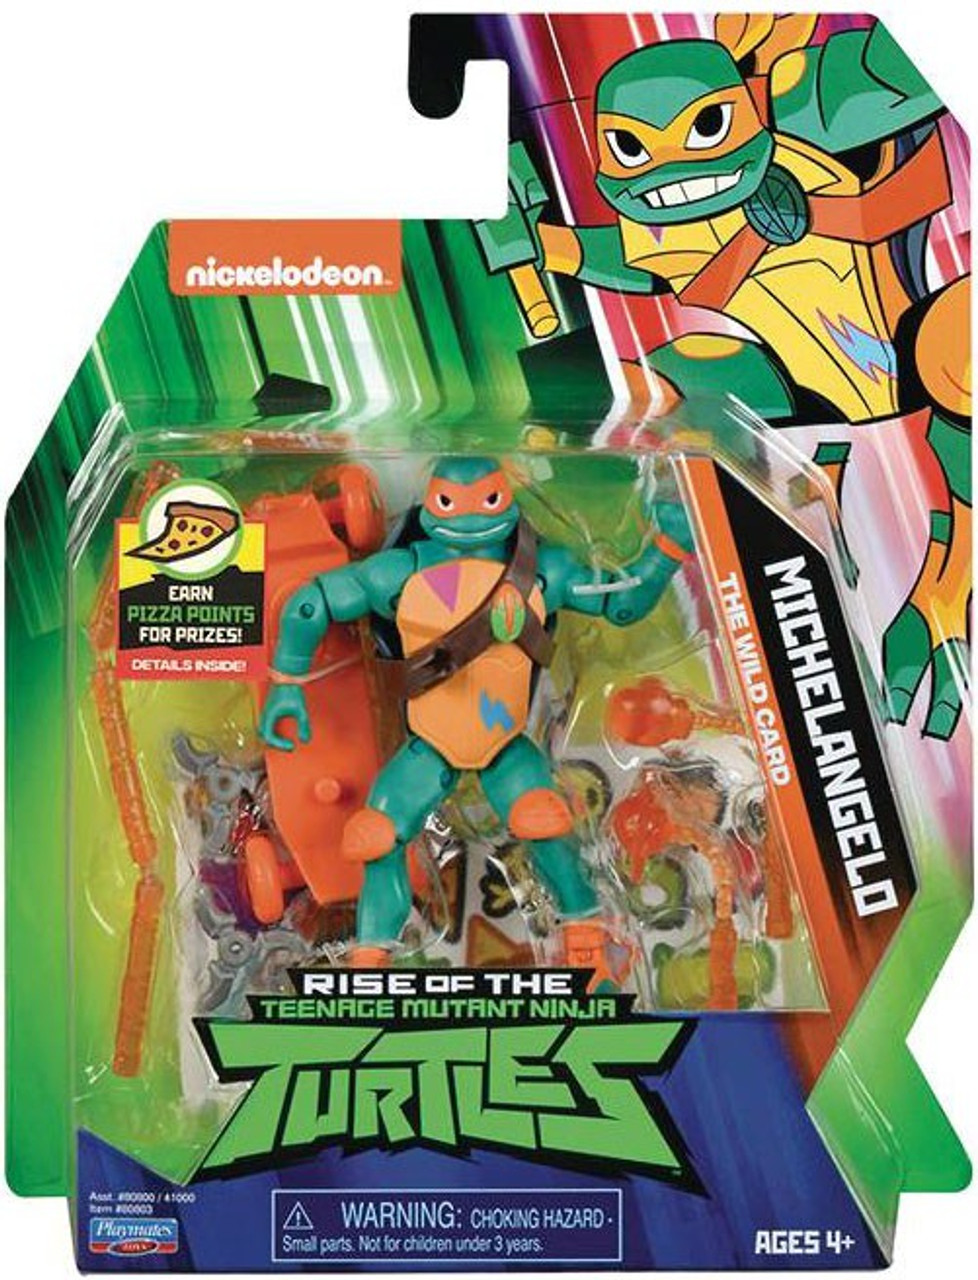 Teenage Mutant Ninja Turtles Nickelodeon Rise of the TMNT Michelangelo  Action Figure [The Wild Card]